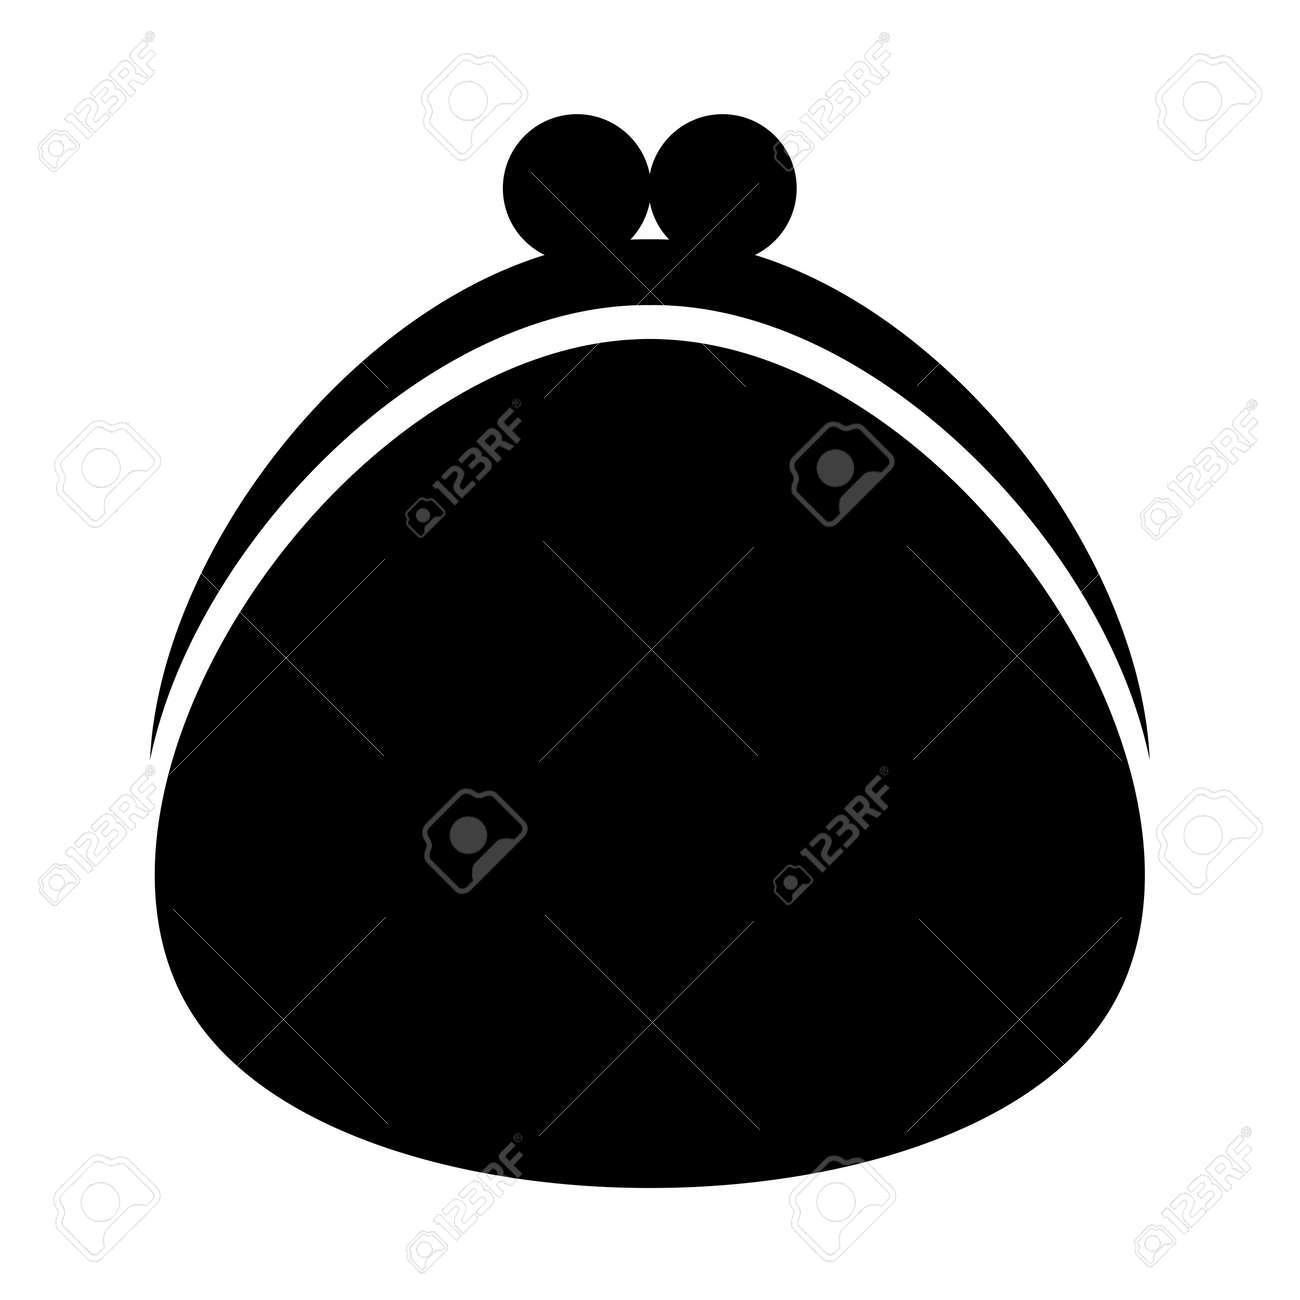 Purse icon - 157730554